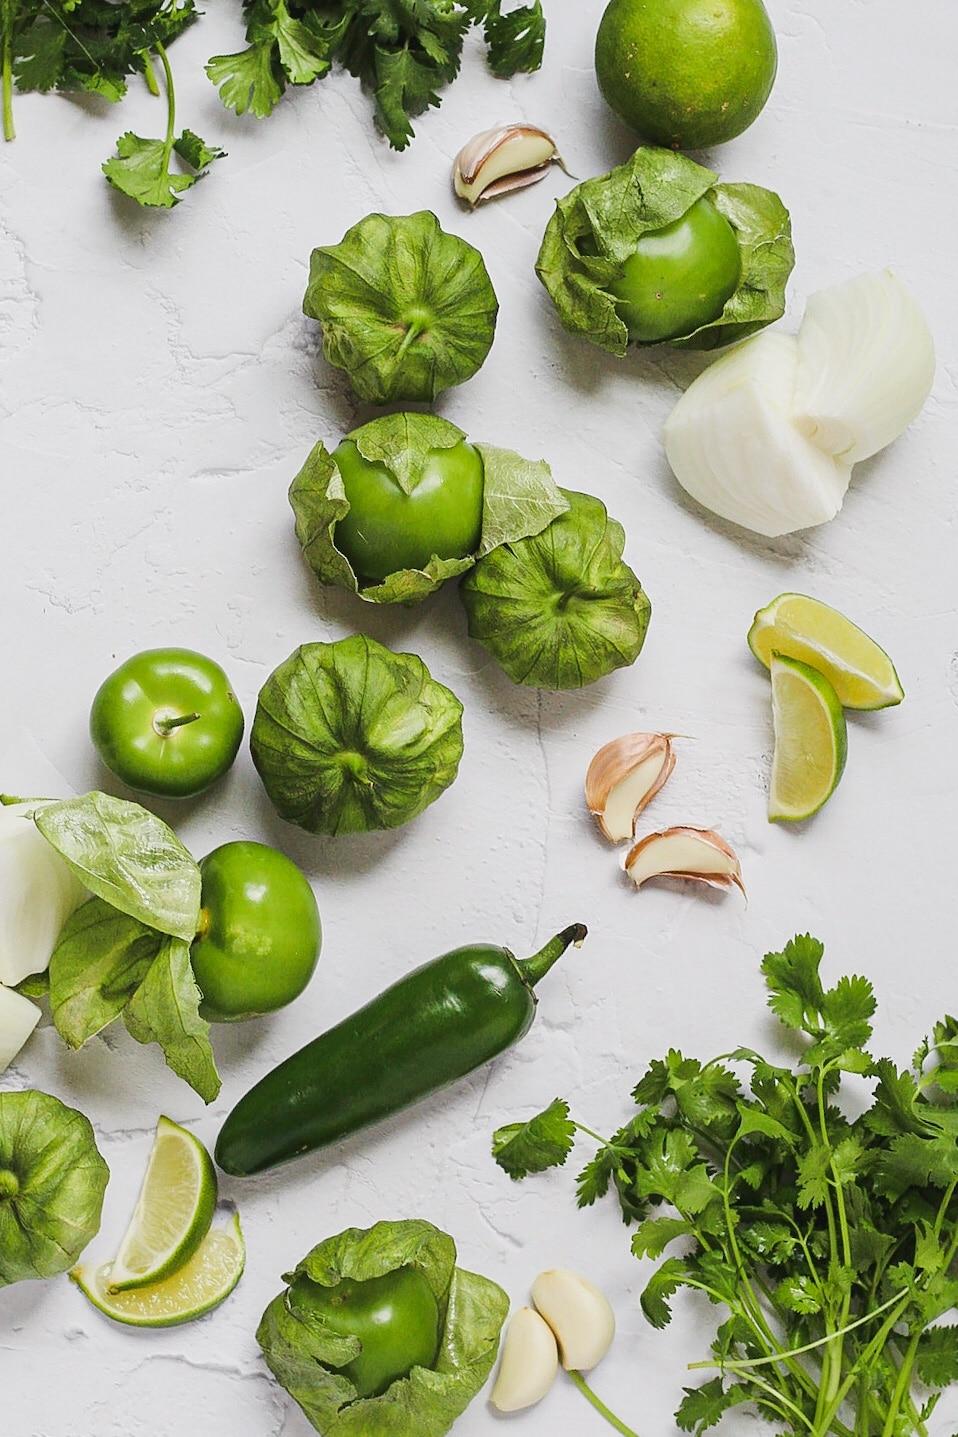 raw ingredients for fresh tomatillo salsa